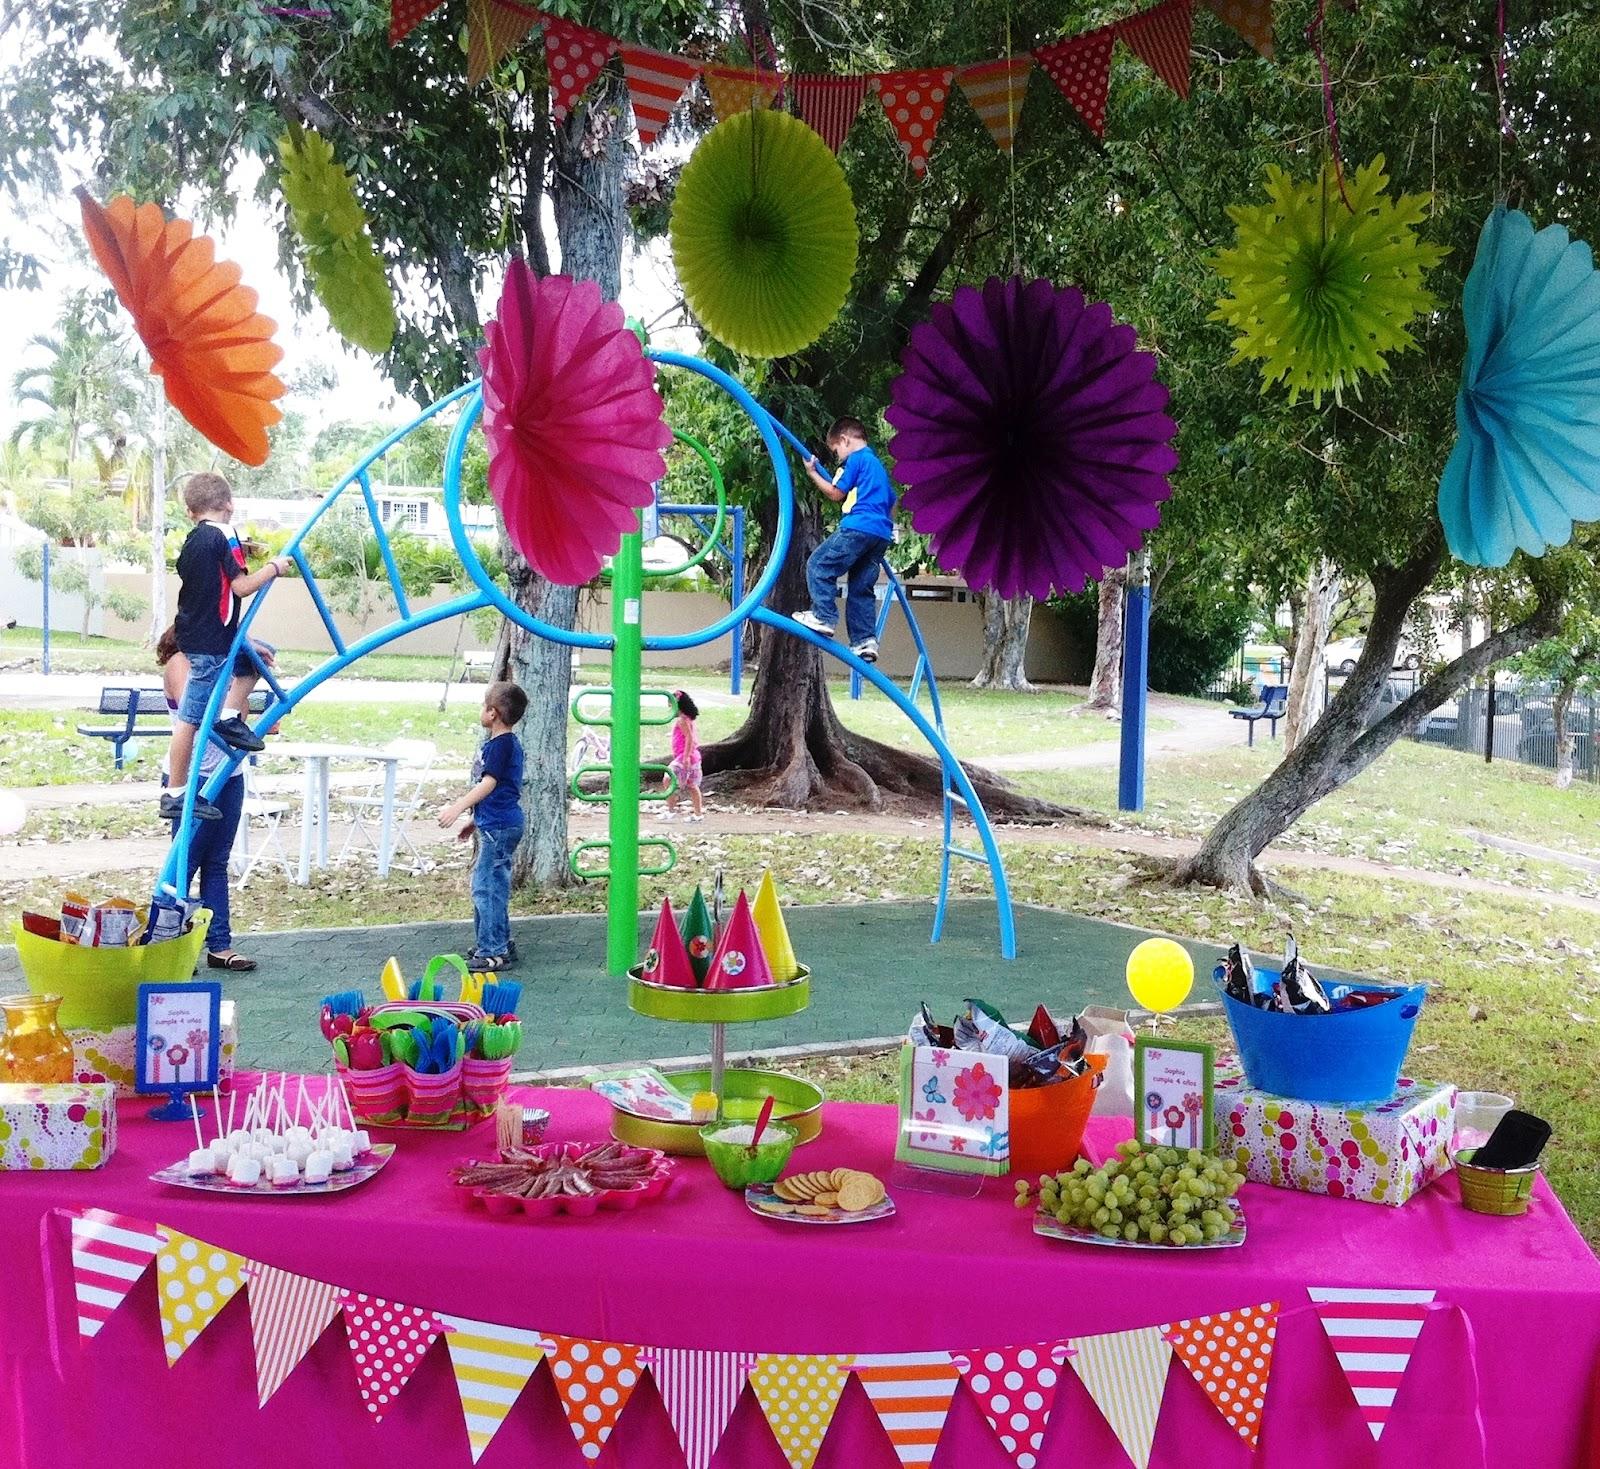 Qu bello es todo fiesta jardin de flores for Fiesta de jardin